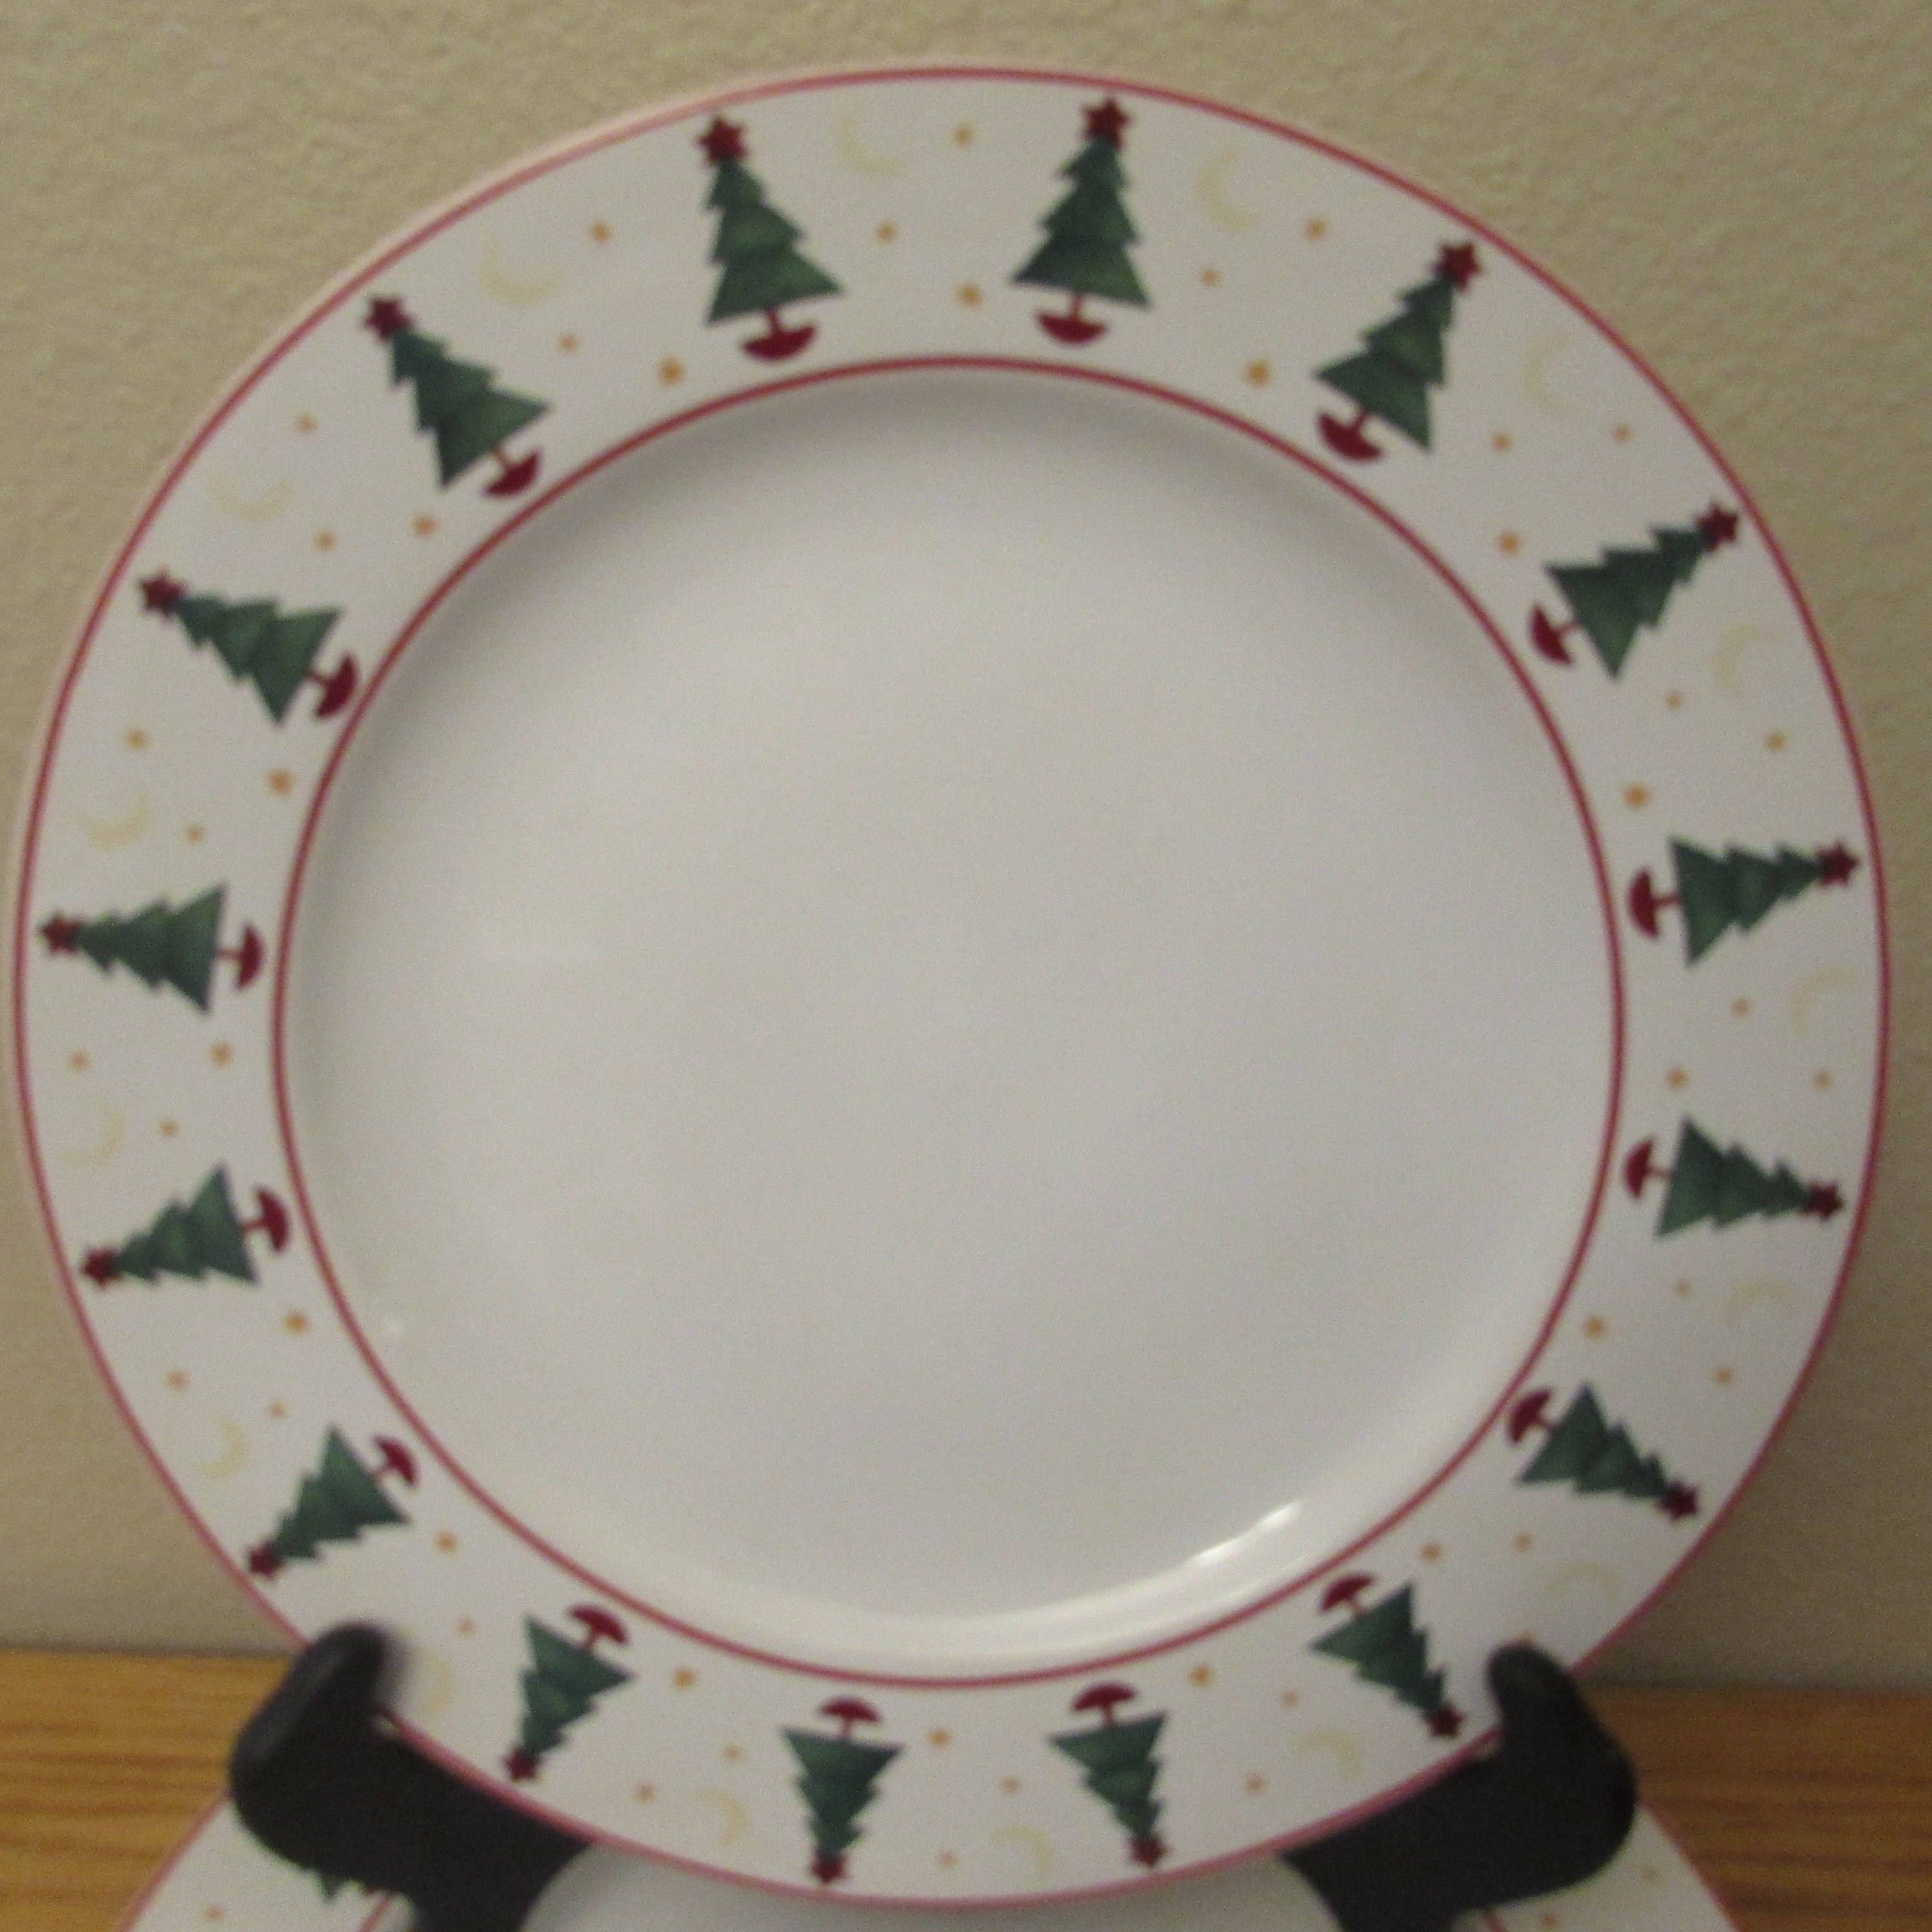 Vintage Set of 4 Dinner Plates Sakura Magic of Santa by Debbie Mumm 1961 by OldWindmillMarket & Vintage Set of 4 Dinner Plates Sakura Magic of Santa by Debbie Mumm ...